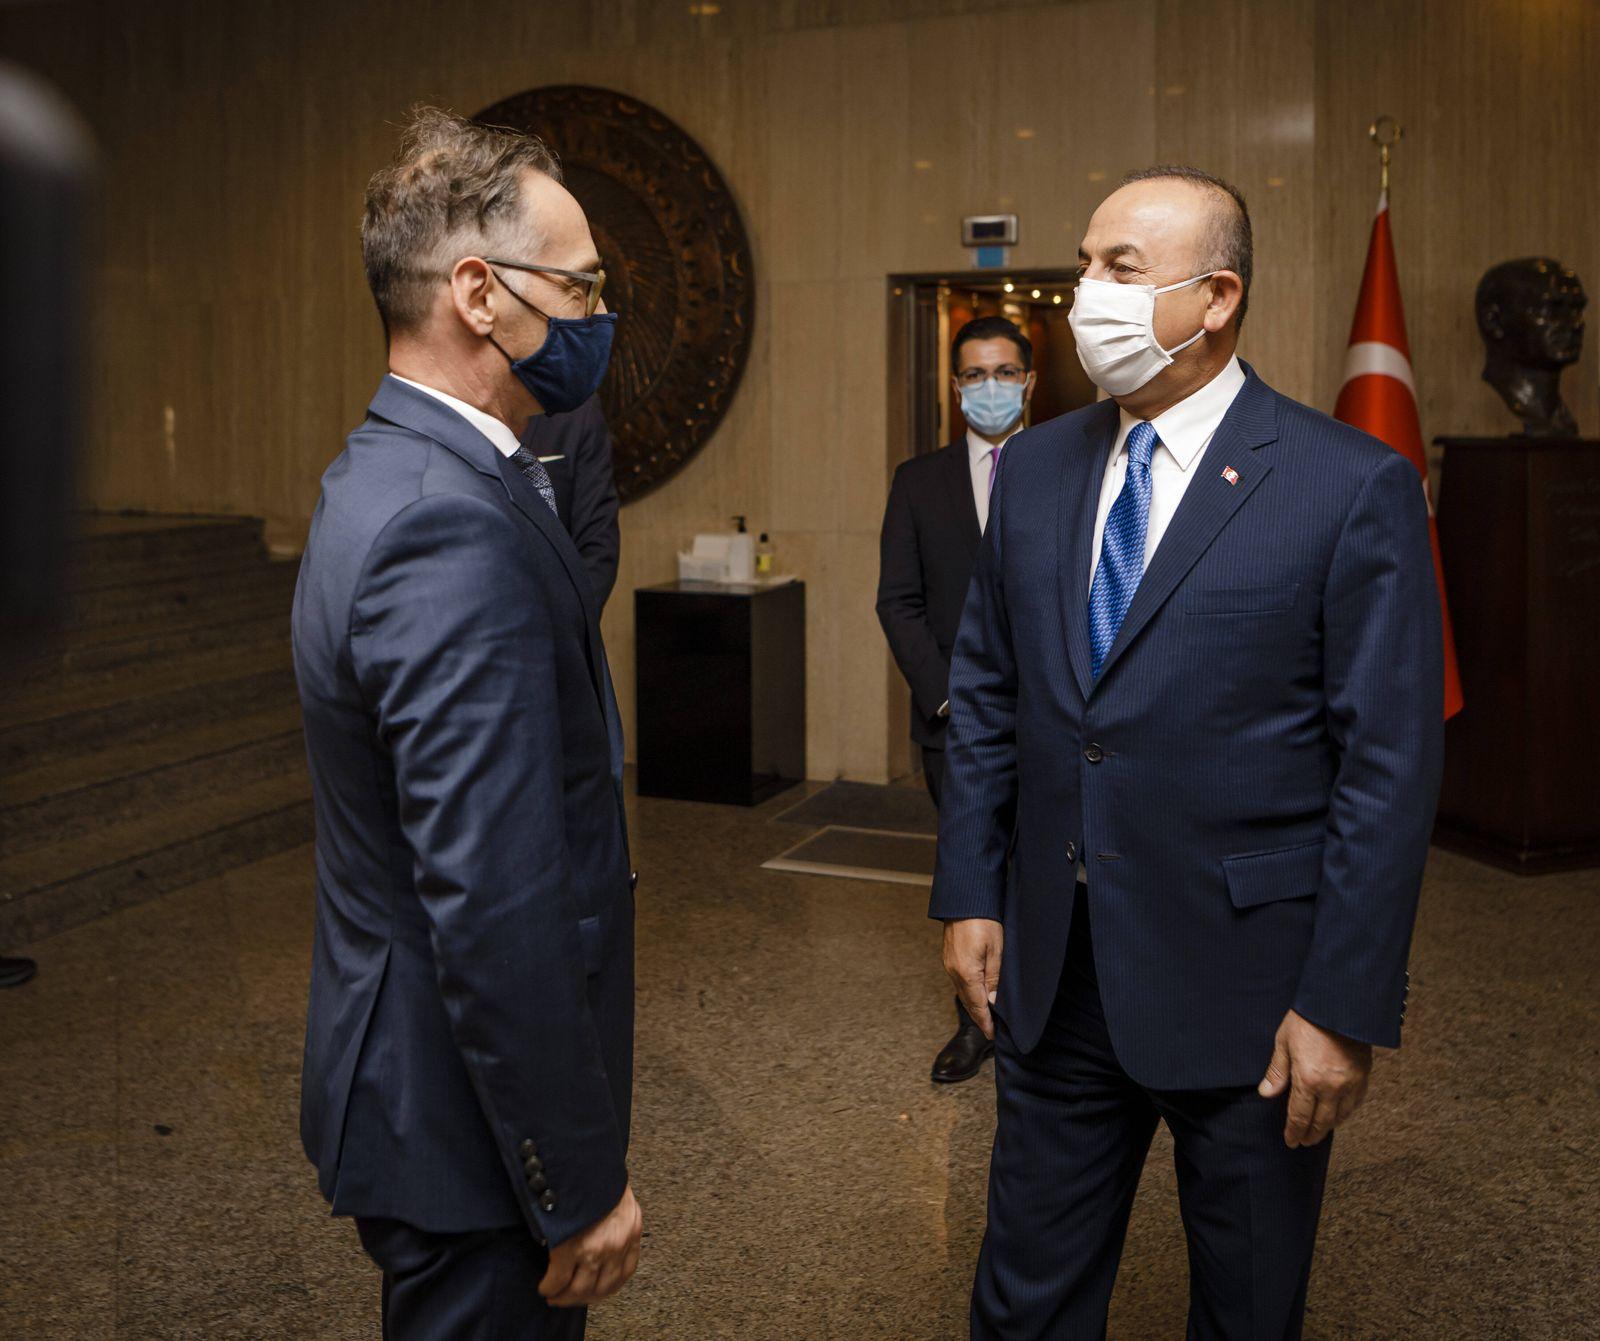 Türkei, Außenminister Mevlüt Cavusoglu empfängt Heiko Maas in Ankara Bundesaussenminister Heiko Maas, SPD, trifft Mevlu